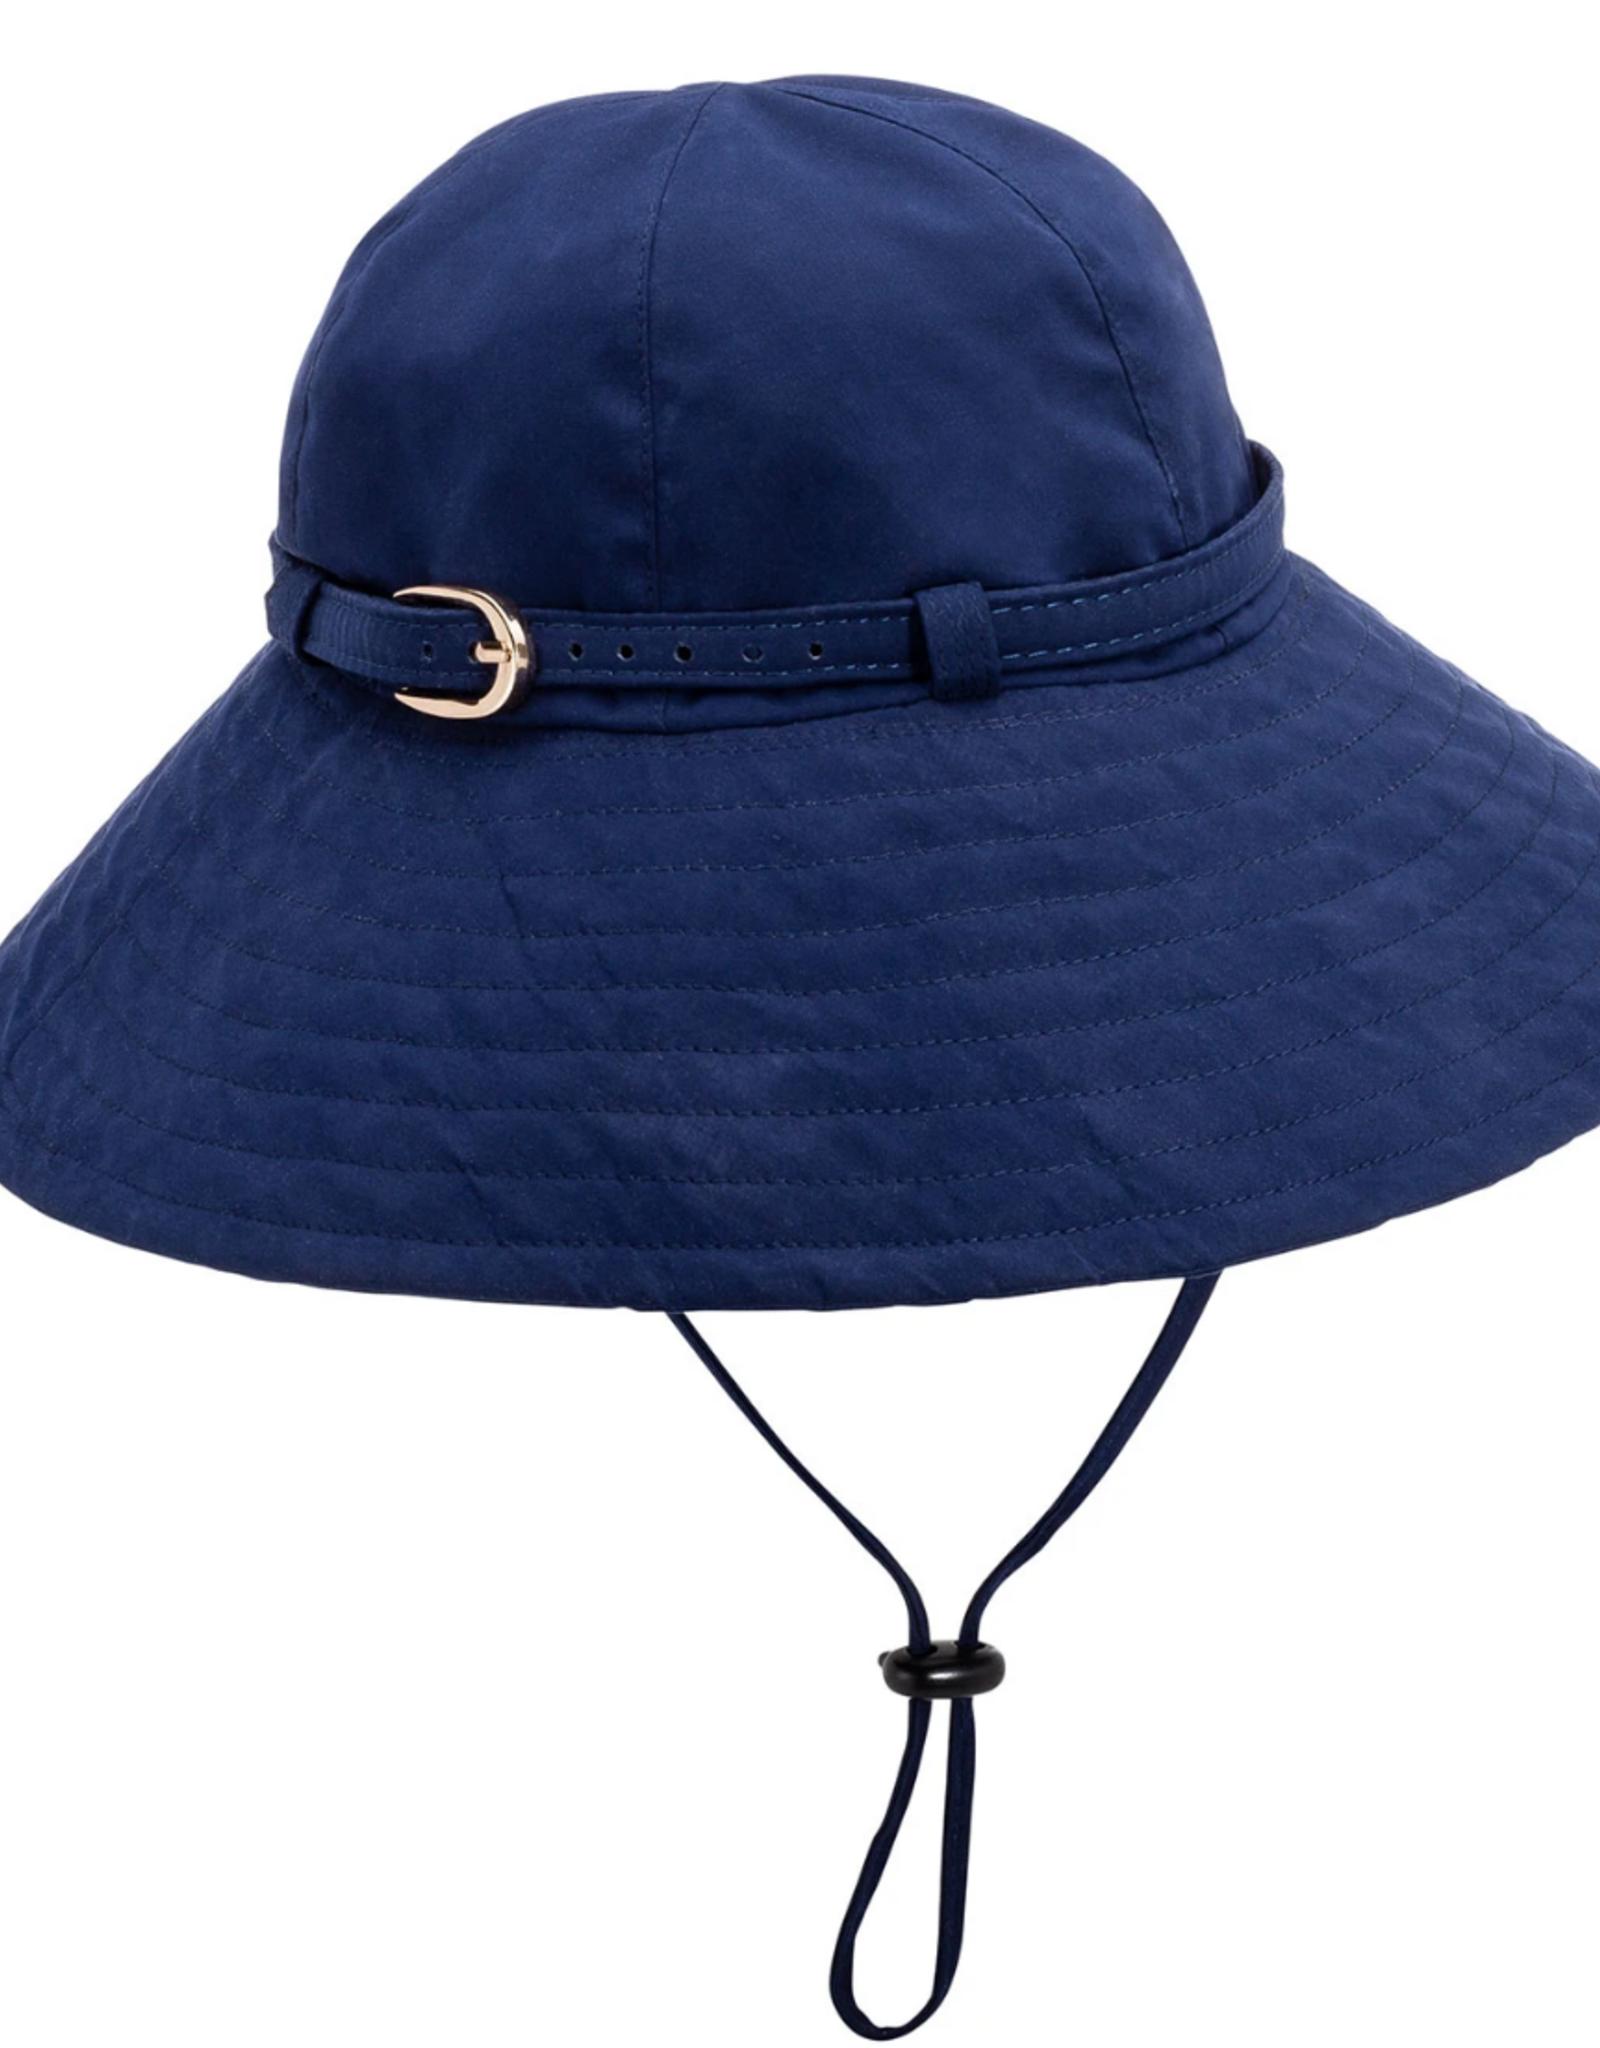 Vinrella Matte Navy Rain/Sun Hat w/Chin Strap